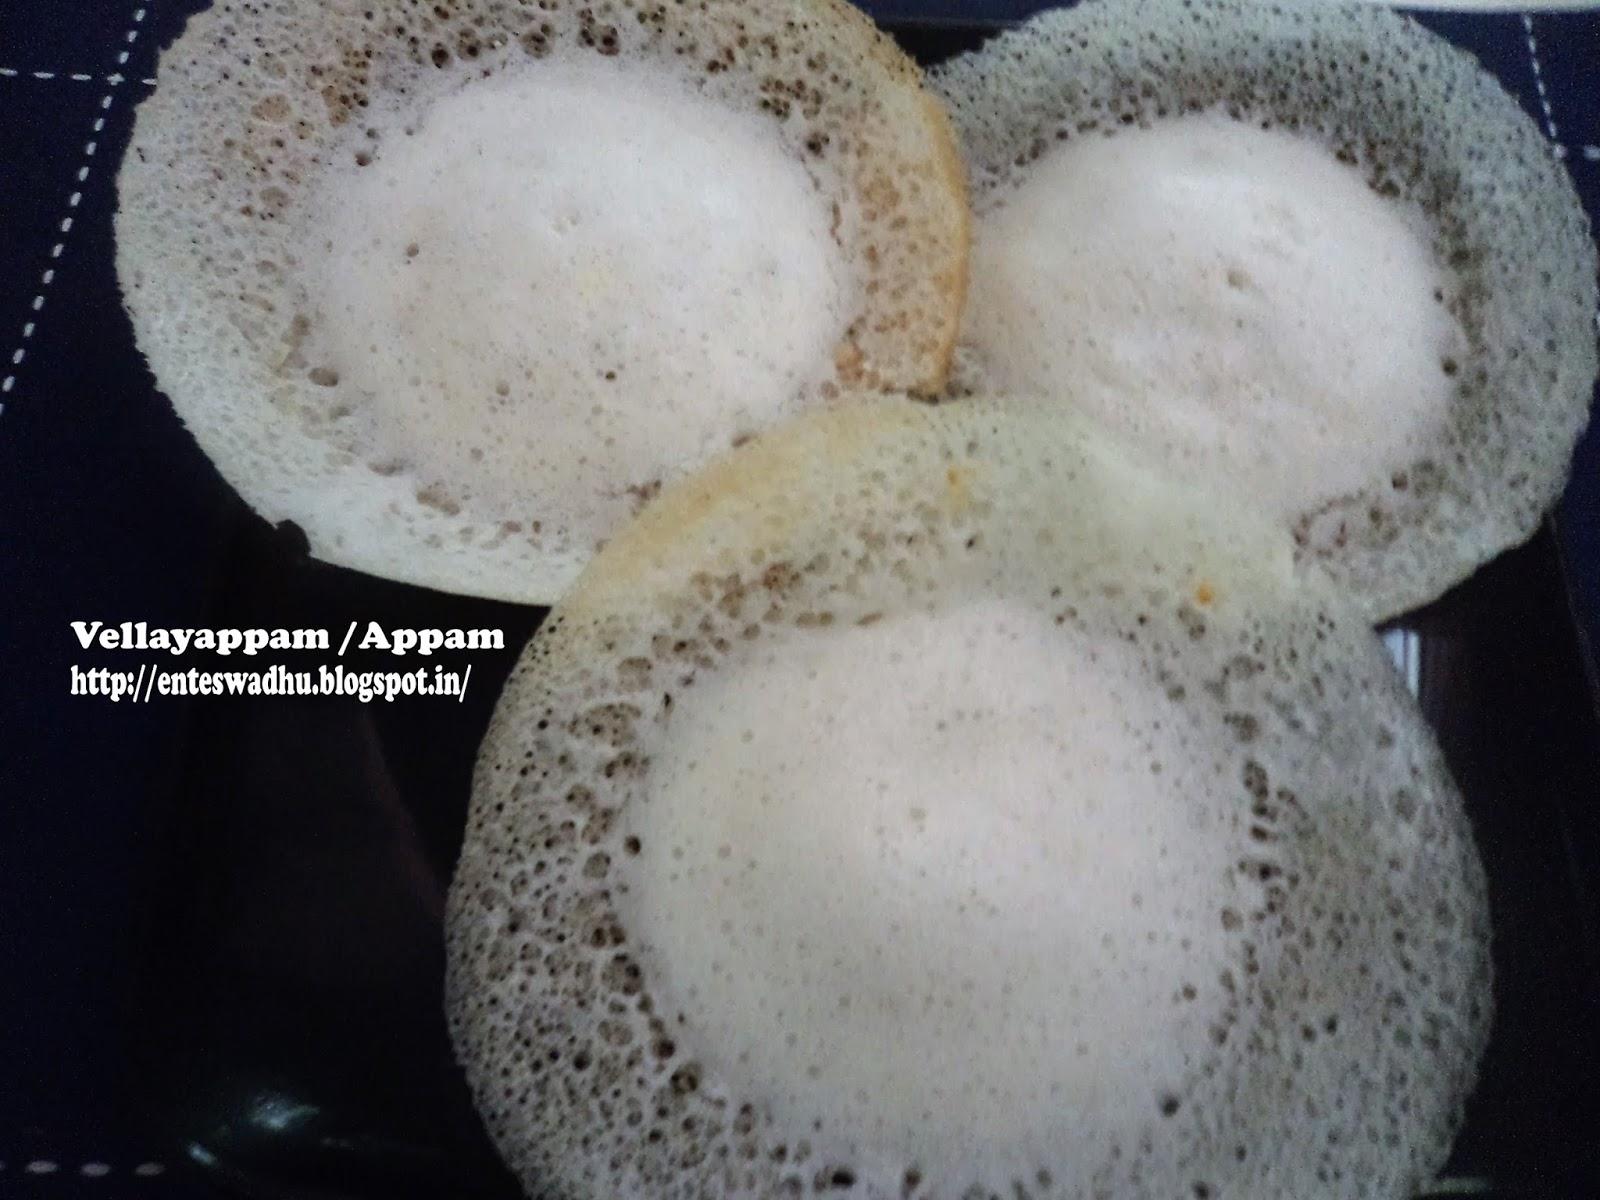 yummy!!!: Vellayappam / Appam with tender coconut water